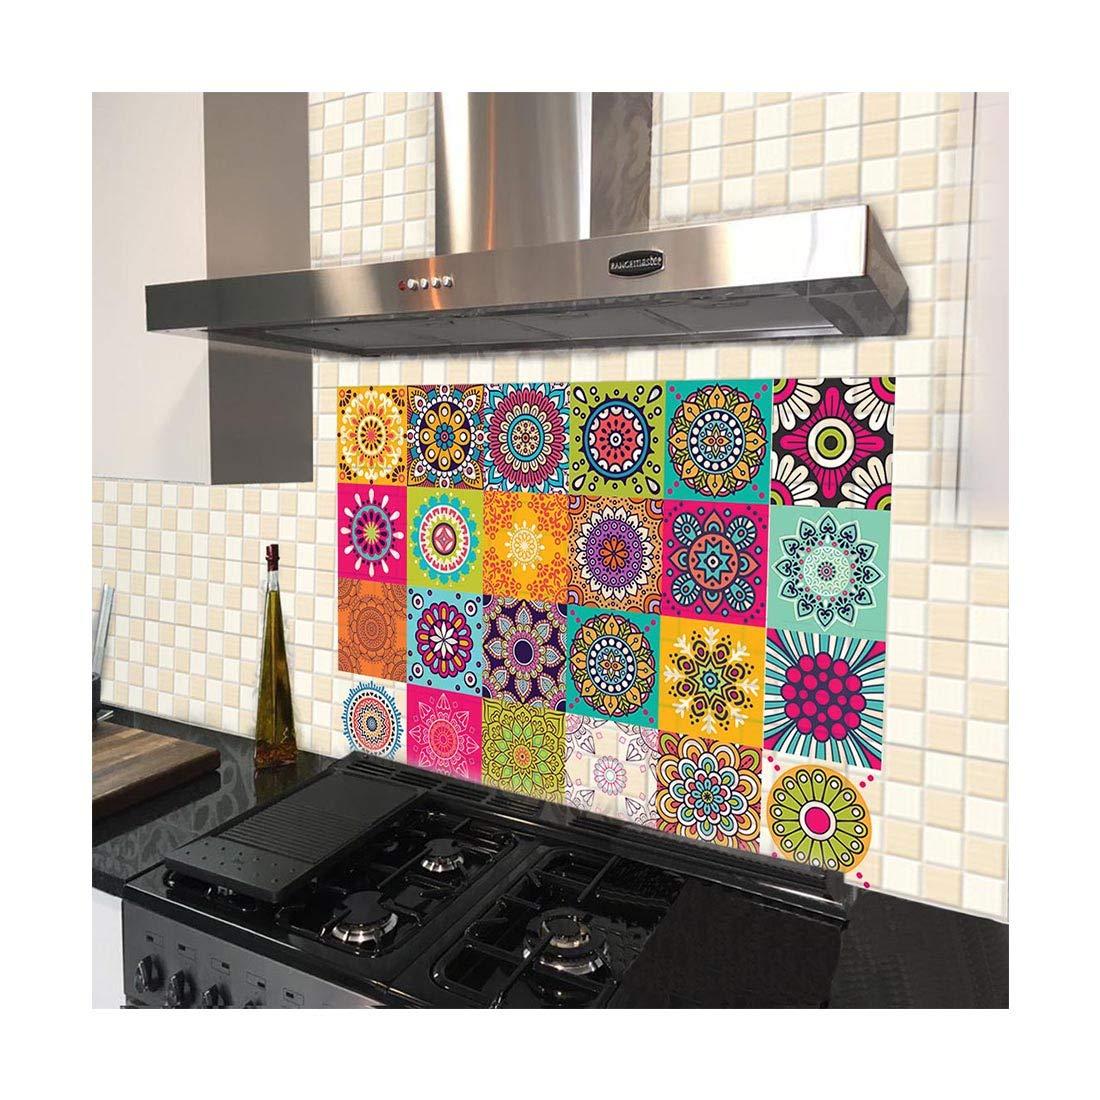 100yellow Vinyl Pvc Mosaic Wall Floor Tile Sticker 15 X 15 Cm Multicolour Amazon In Home Kitchen